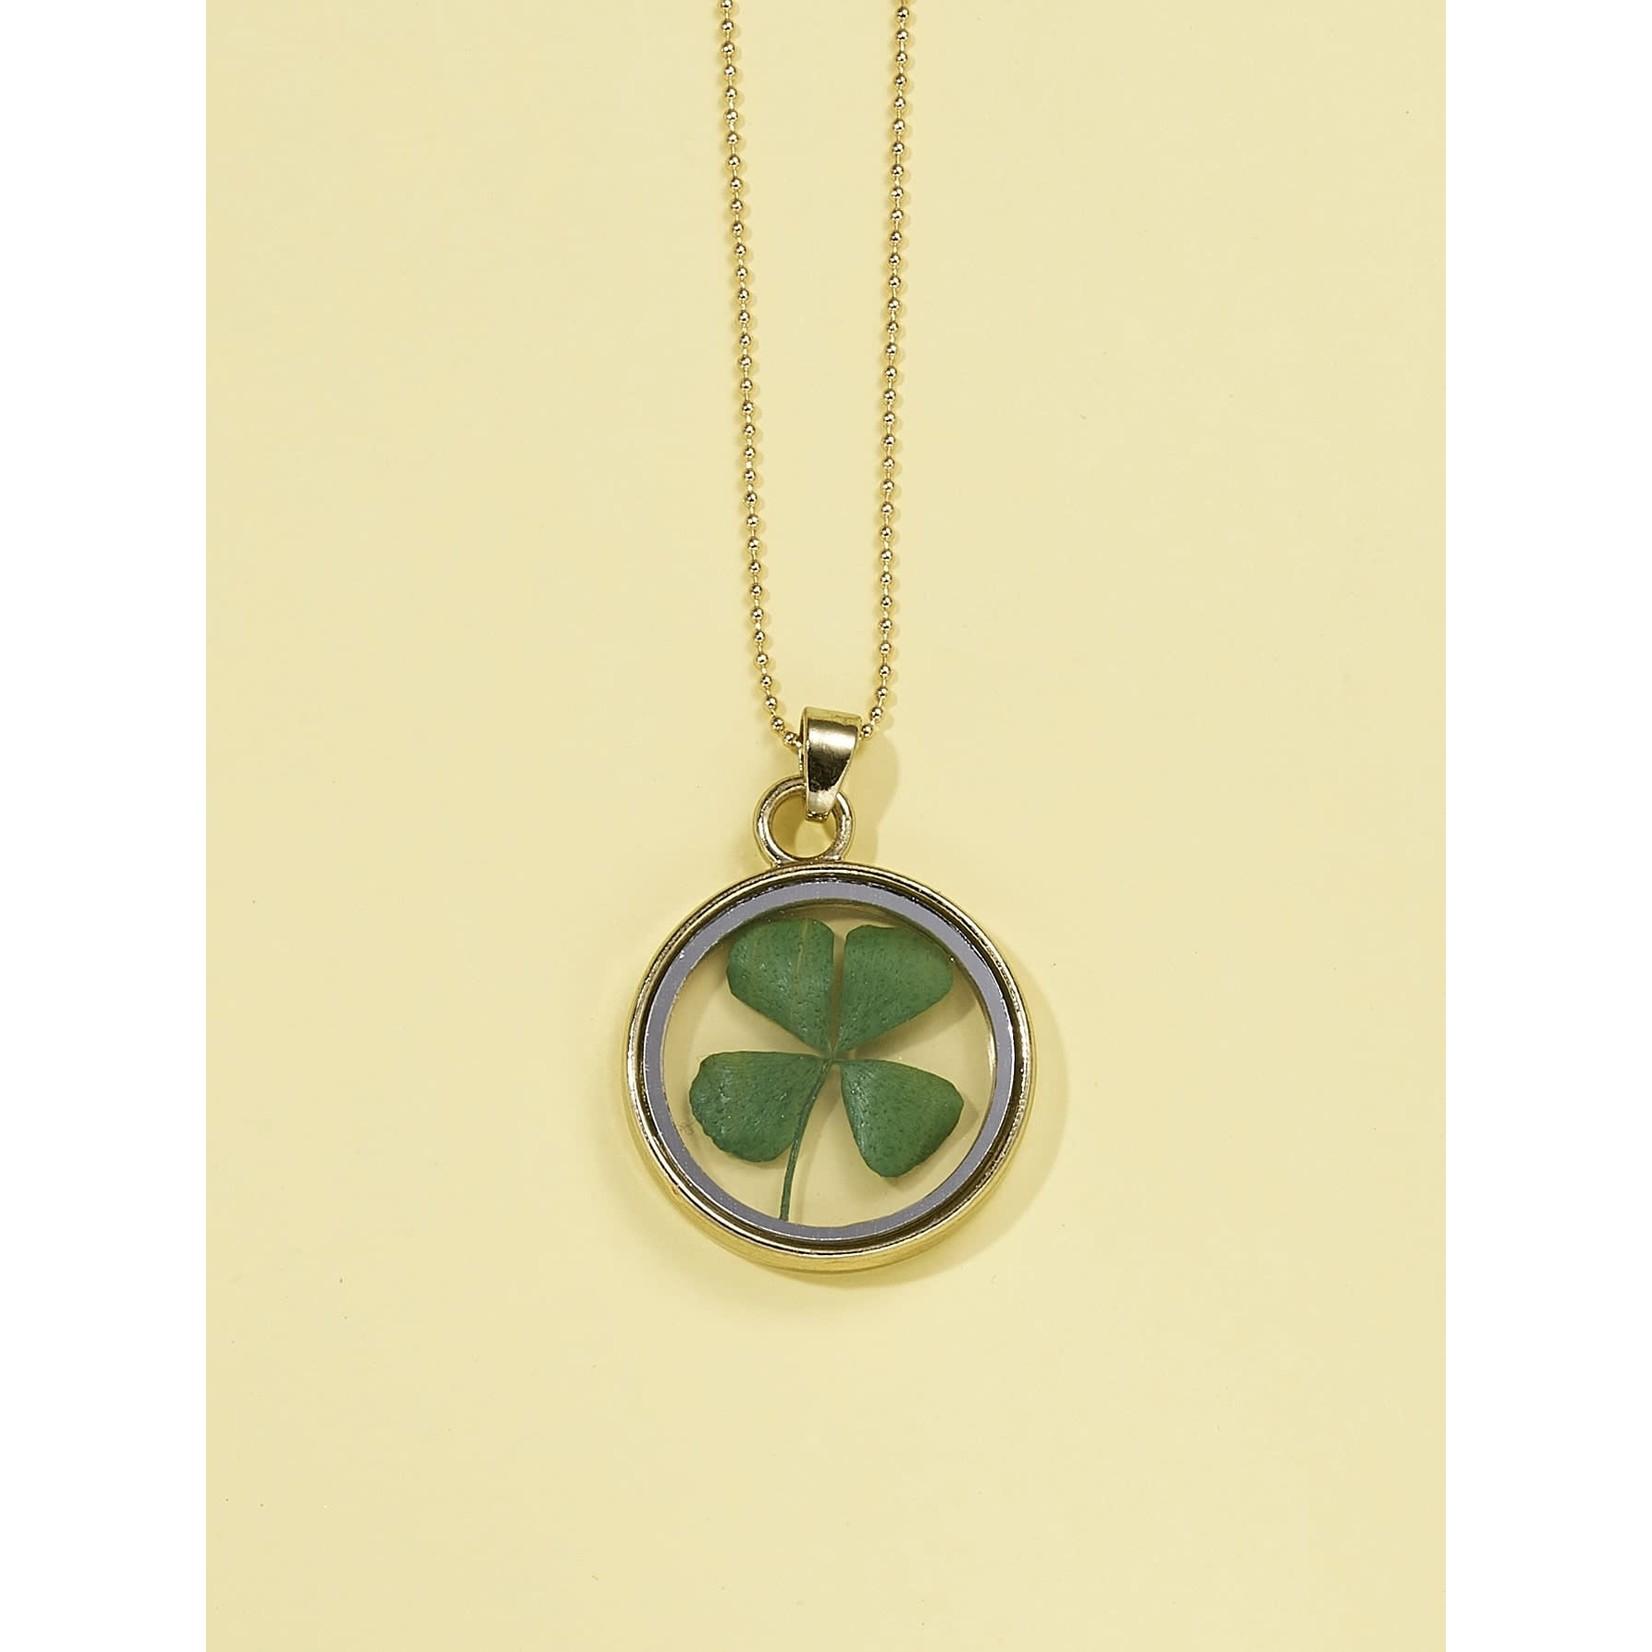 Necklace - Pressed Shamrock